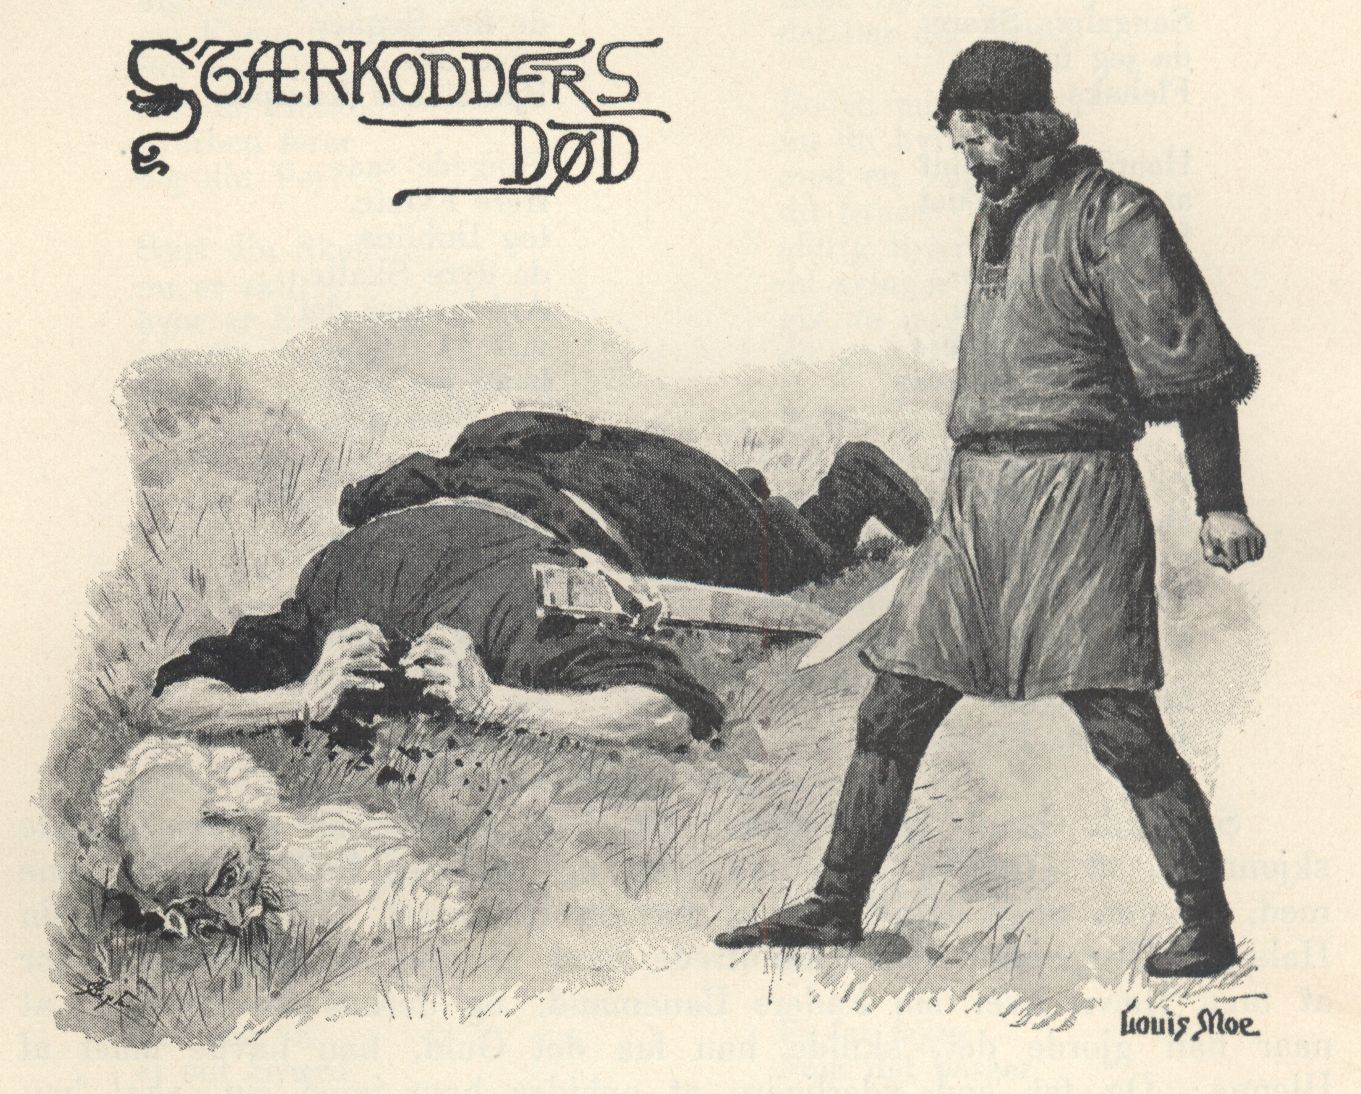 The Death of Starkaðr